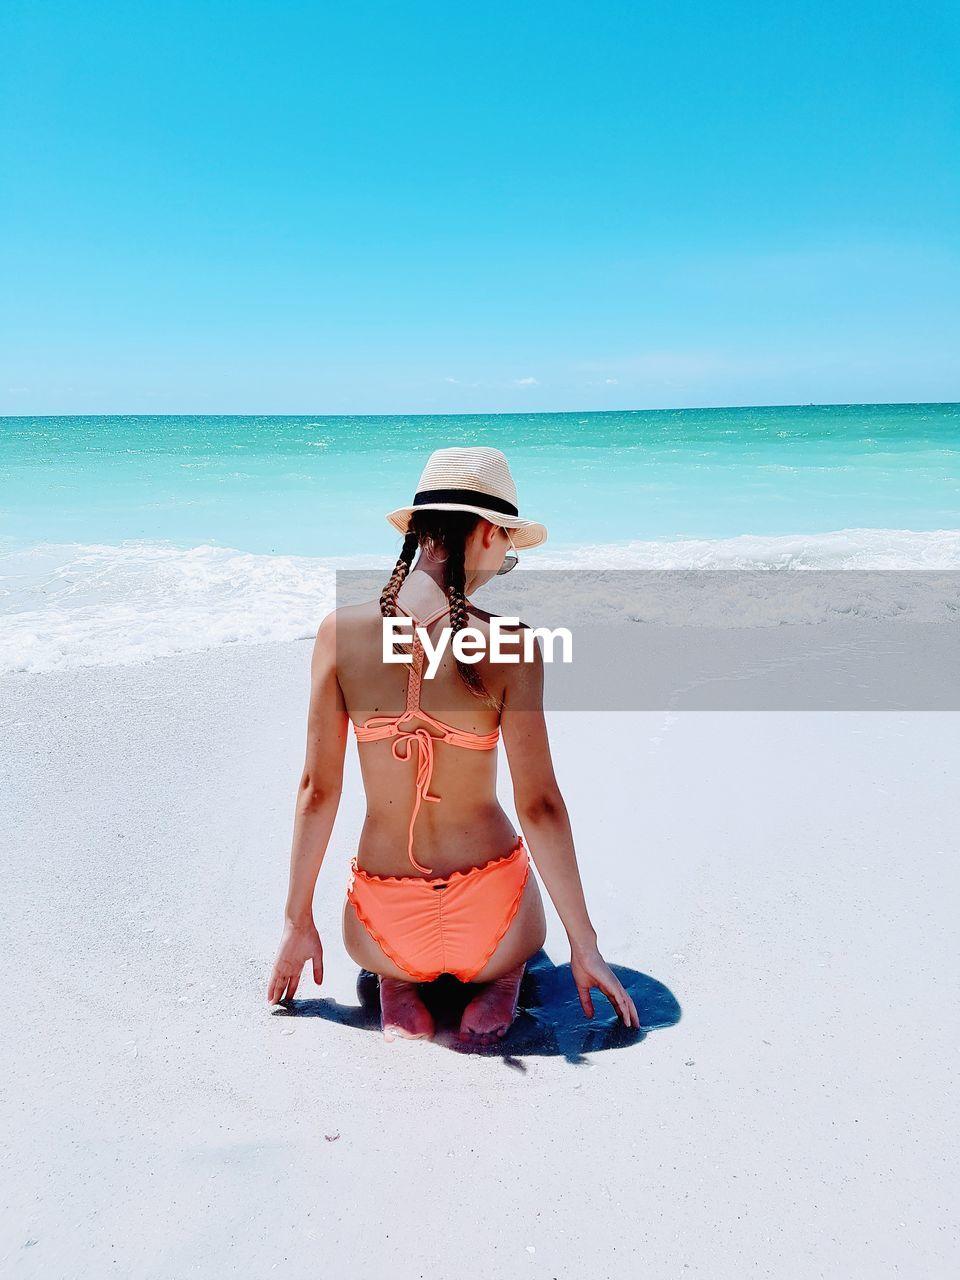 Rear View Of Teenage Girl Wearing Bikini Kneeling At Beach Against Sky During Sunny Day